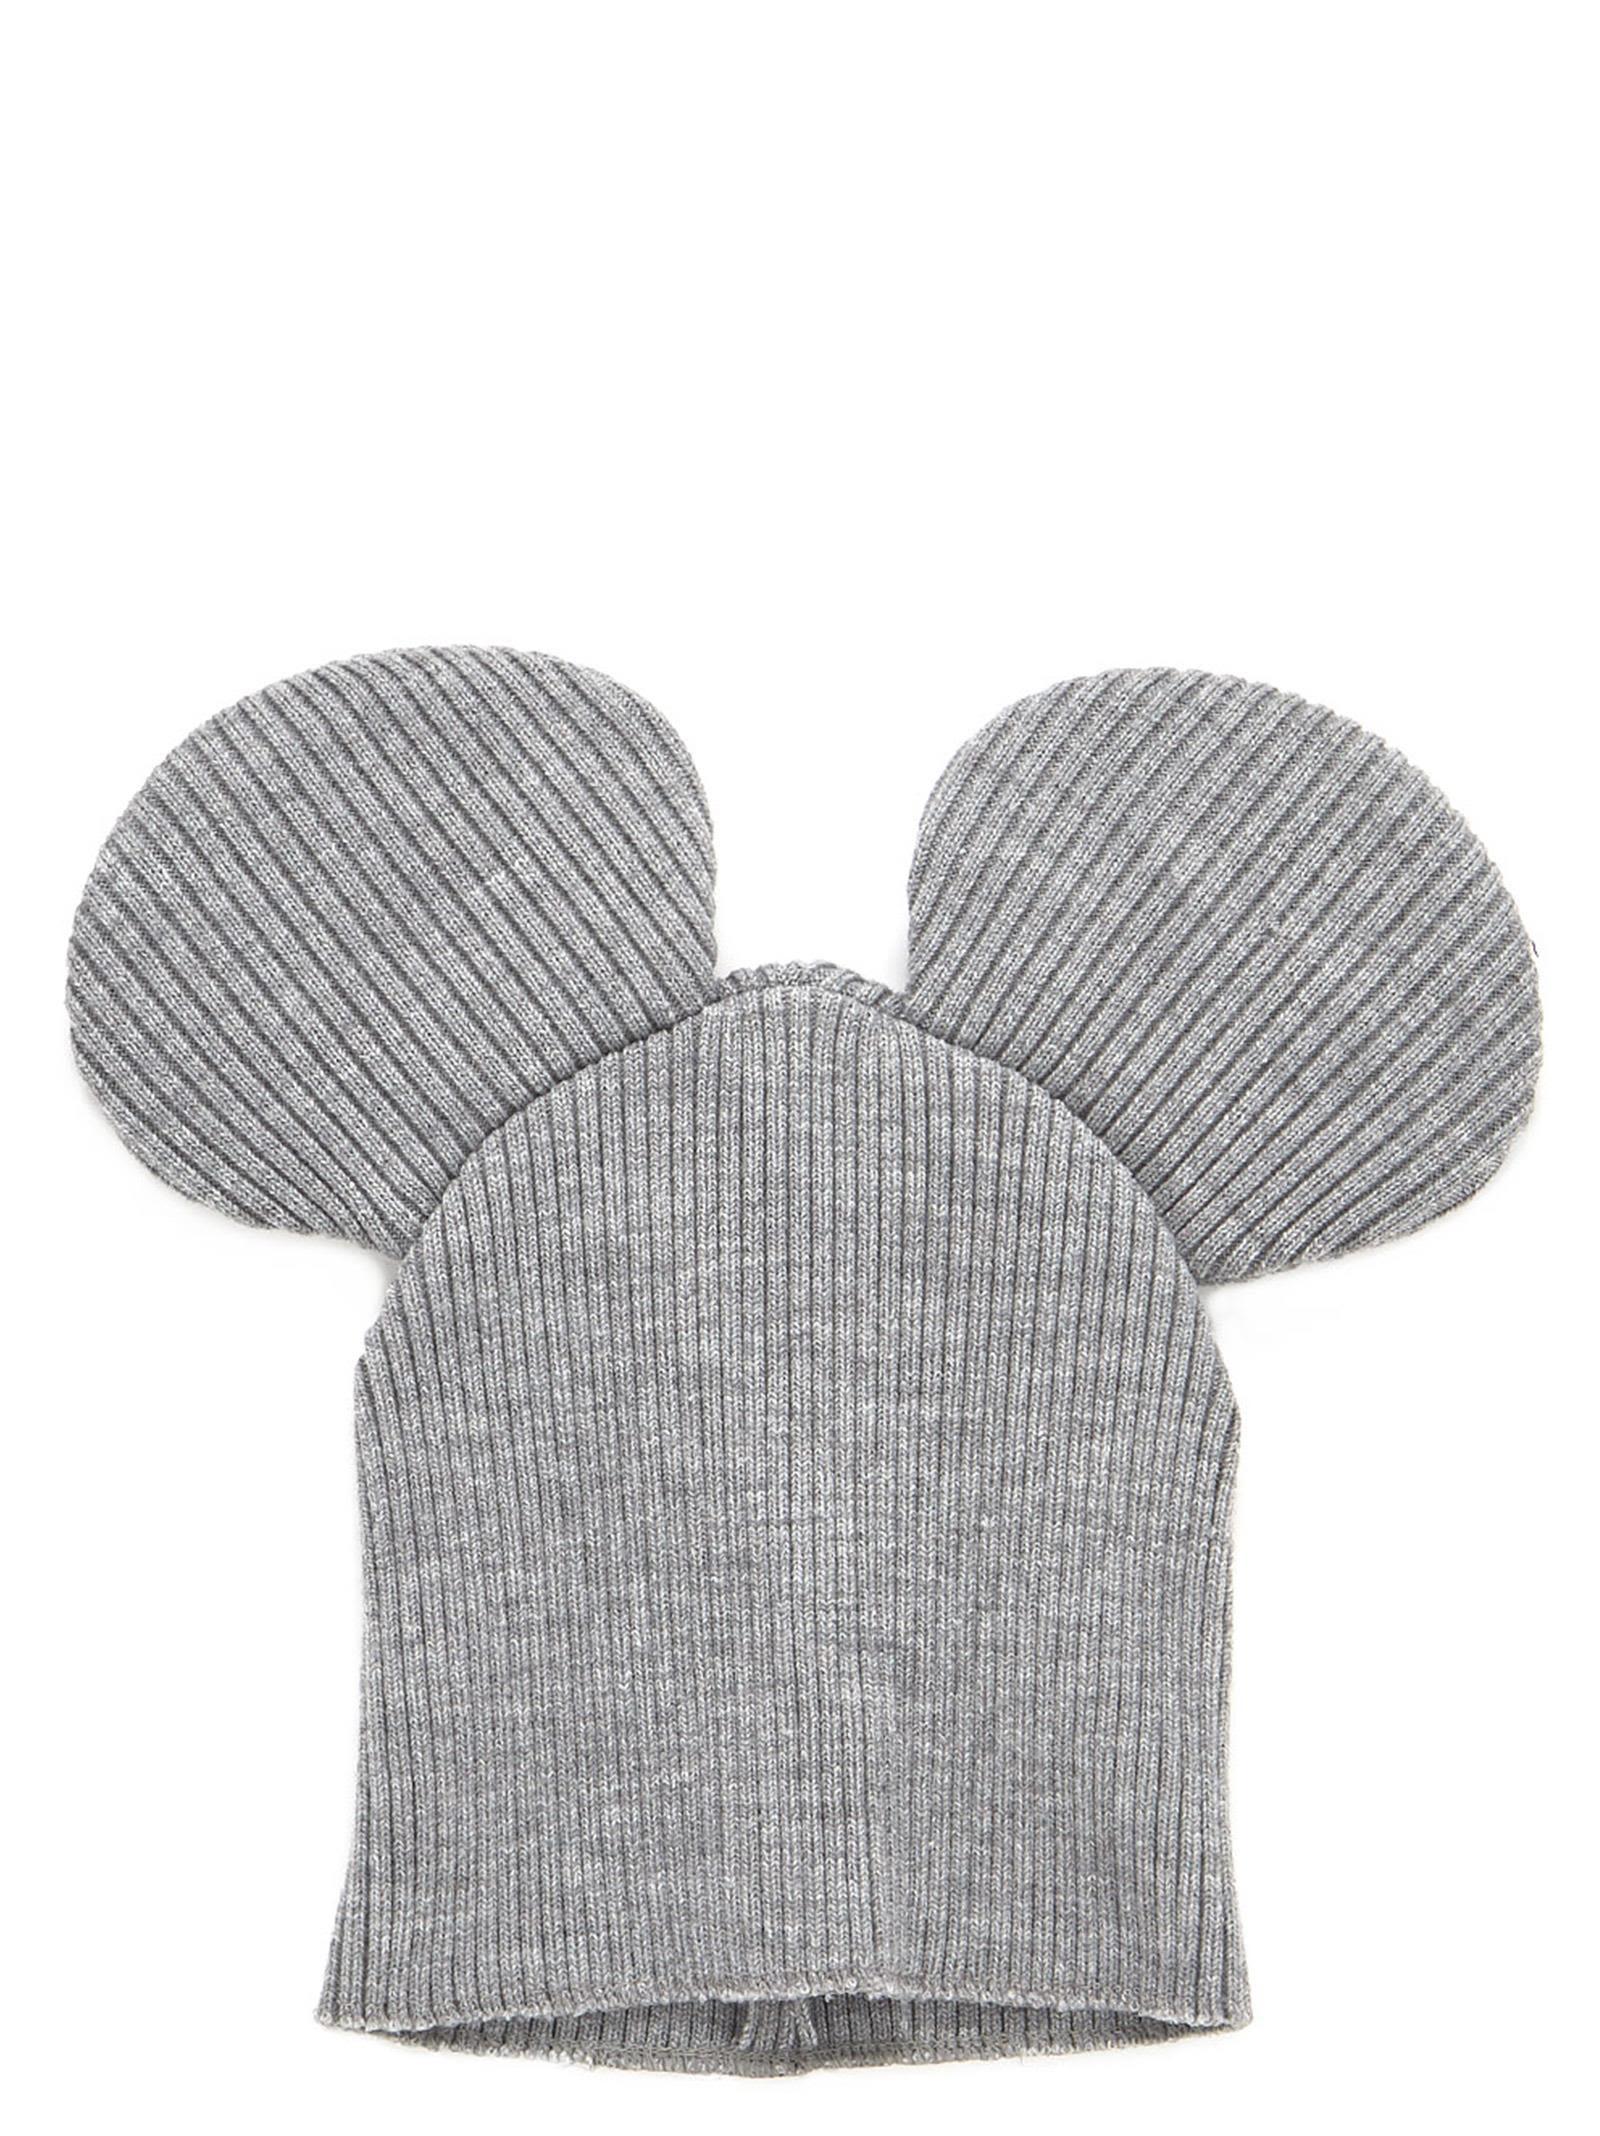 COMME DES GARÇONS BOYS Comme Des Garçons Boy Beany Mickey Mouse in Grey